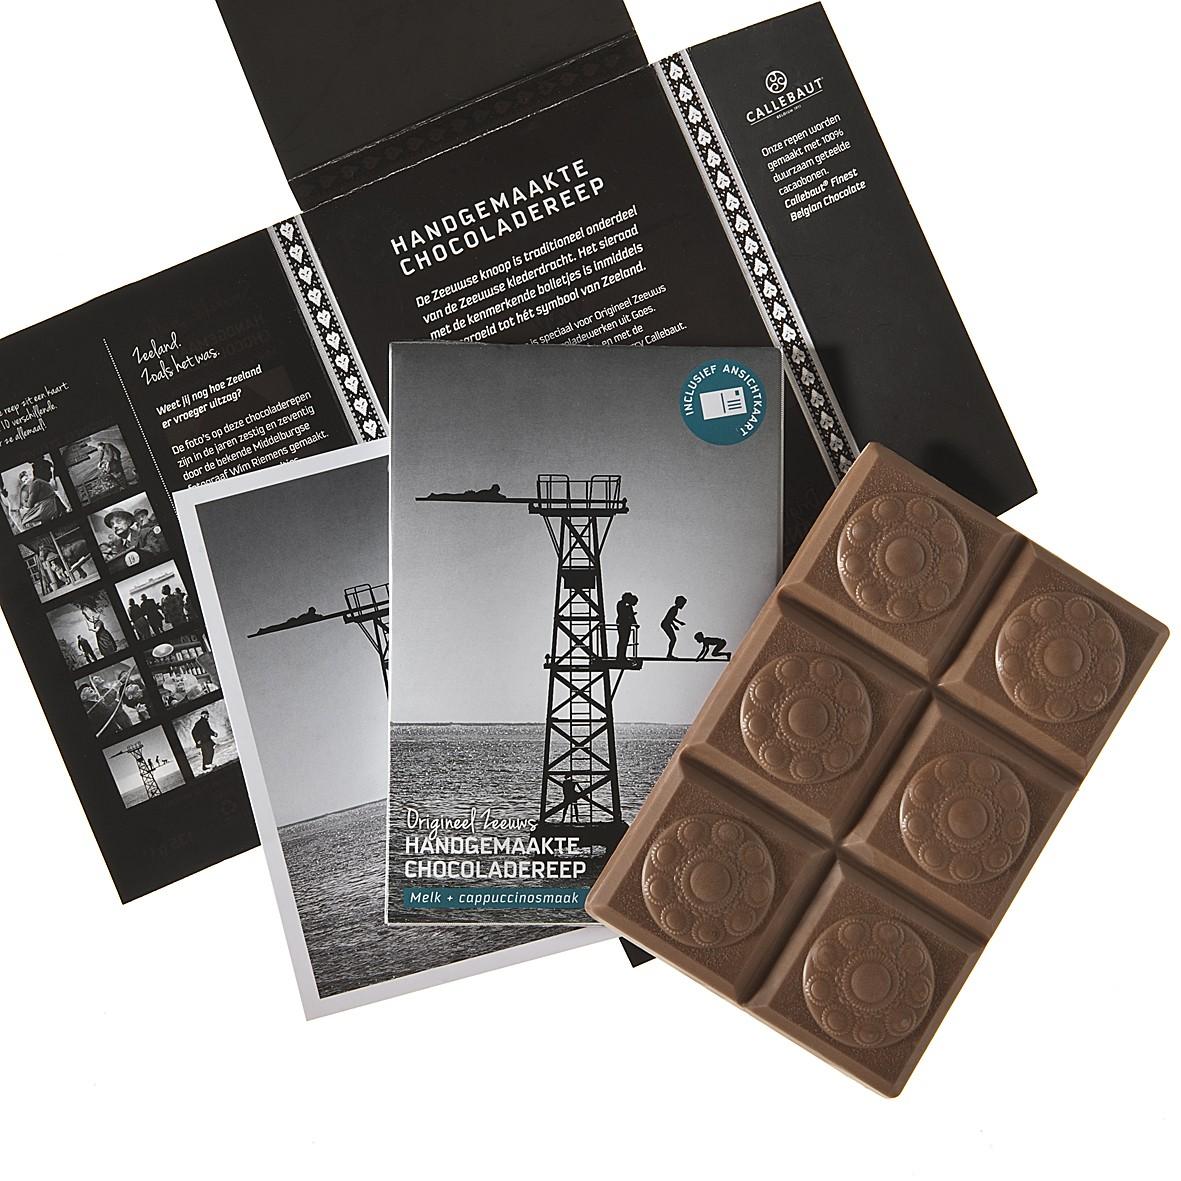 Zeeuwse Handgemaakte Chocoladereep